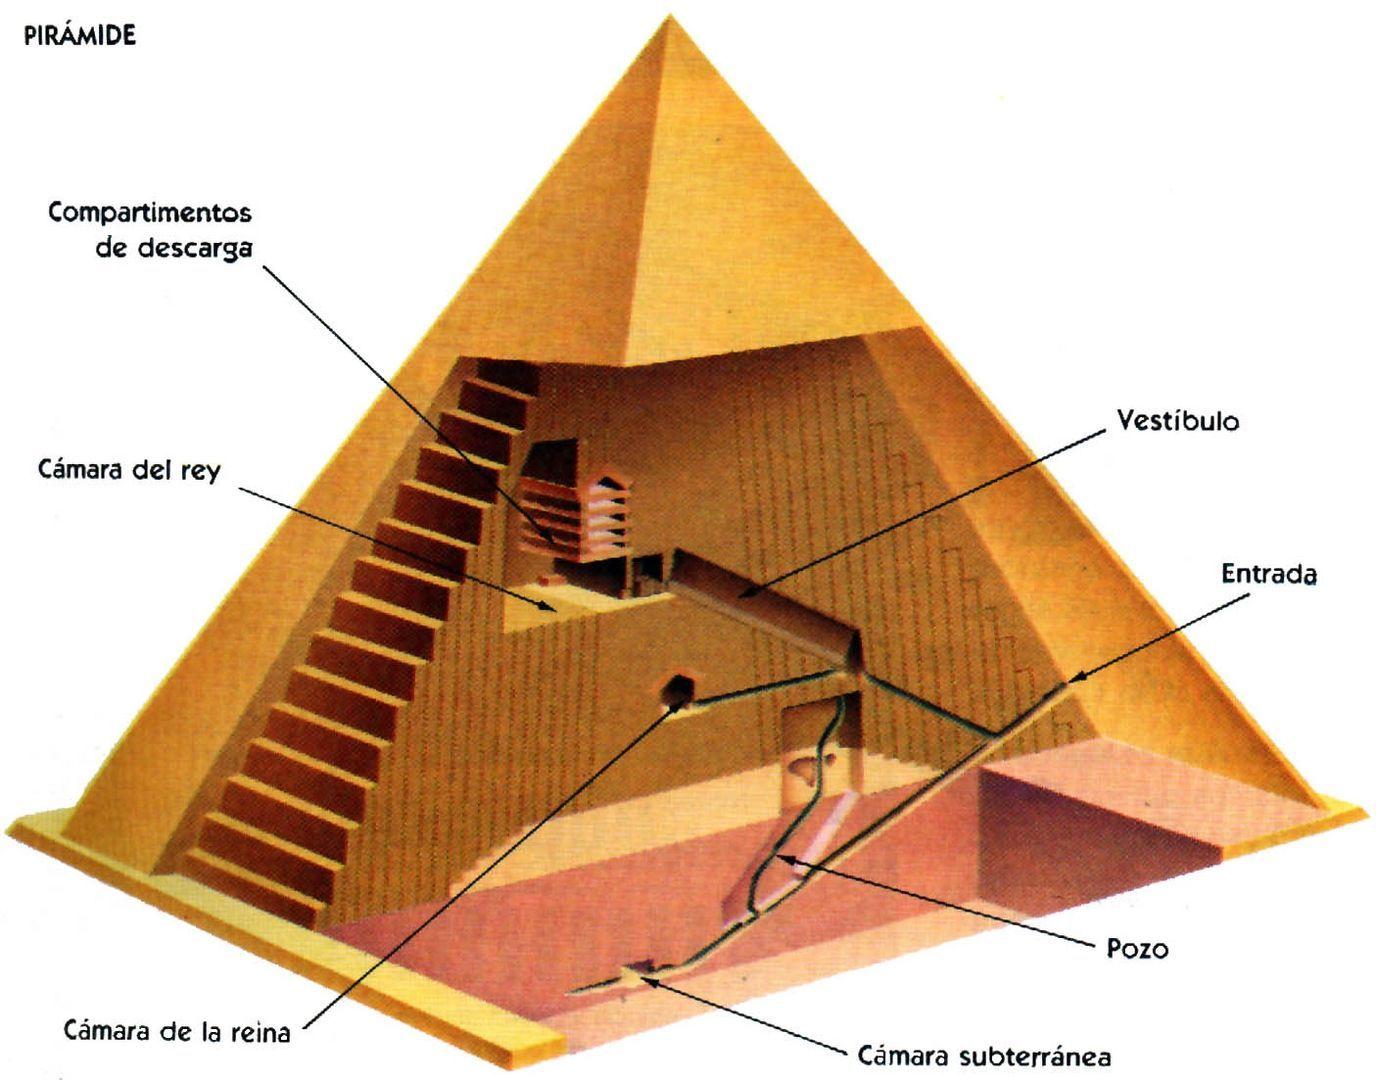 Imagenes De Piramides Egipcias Fotos De Piramides Egipcias Fotografias De Piramides Egipcias Piramides De Egipto Piramides Egipcias Egipto